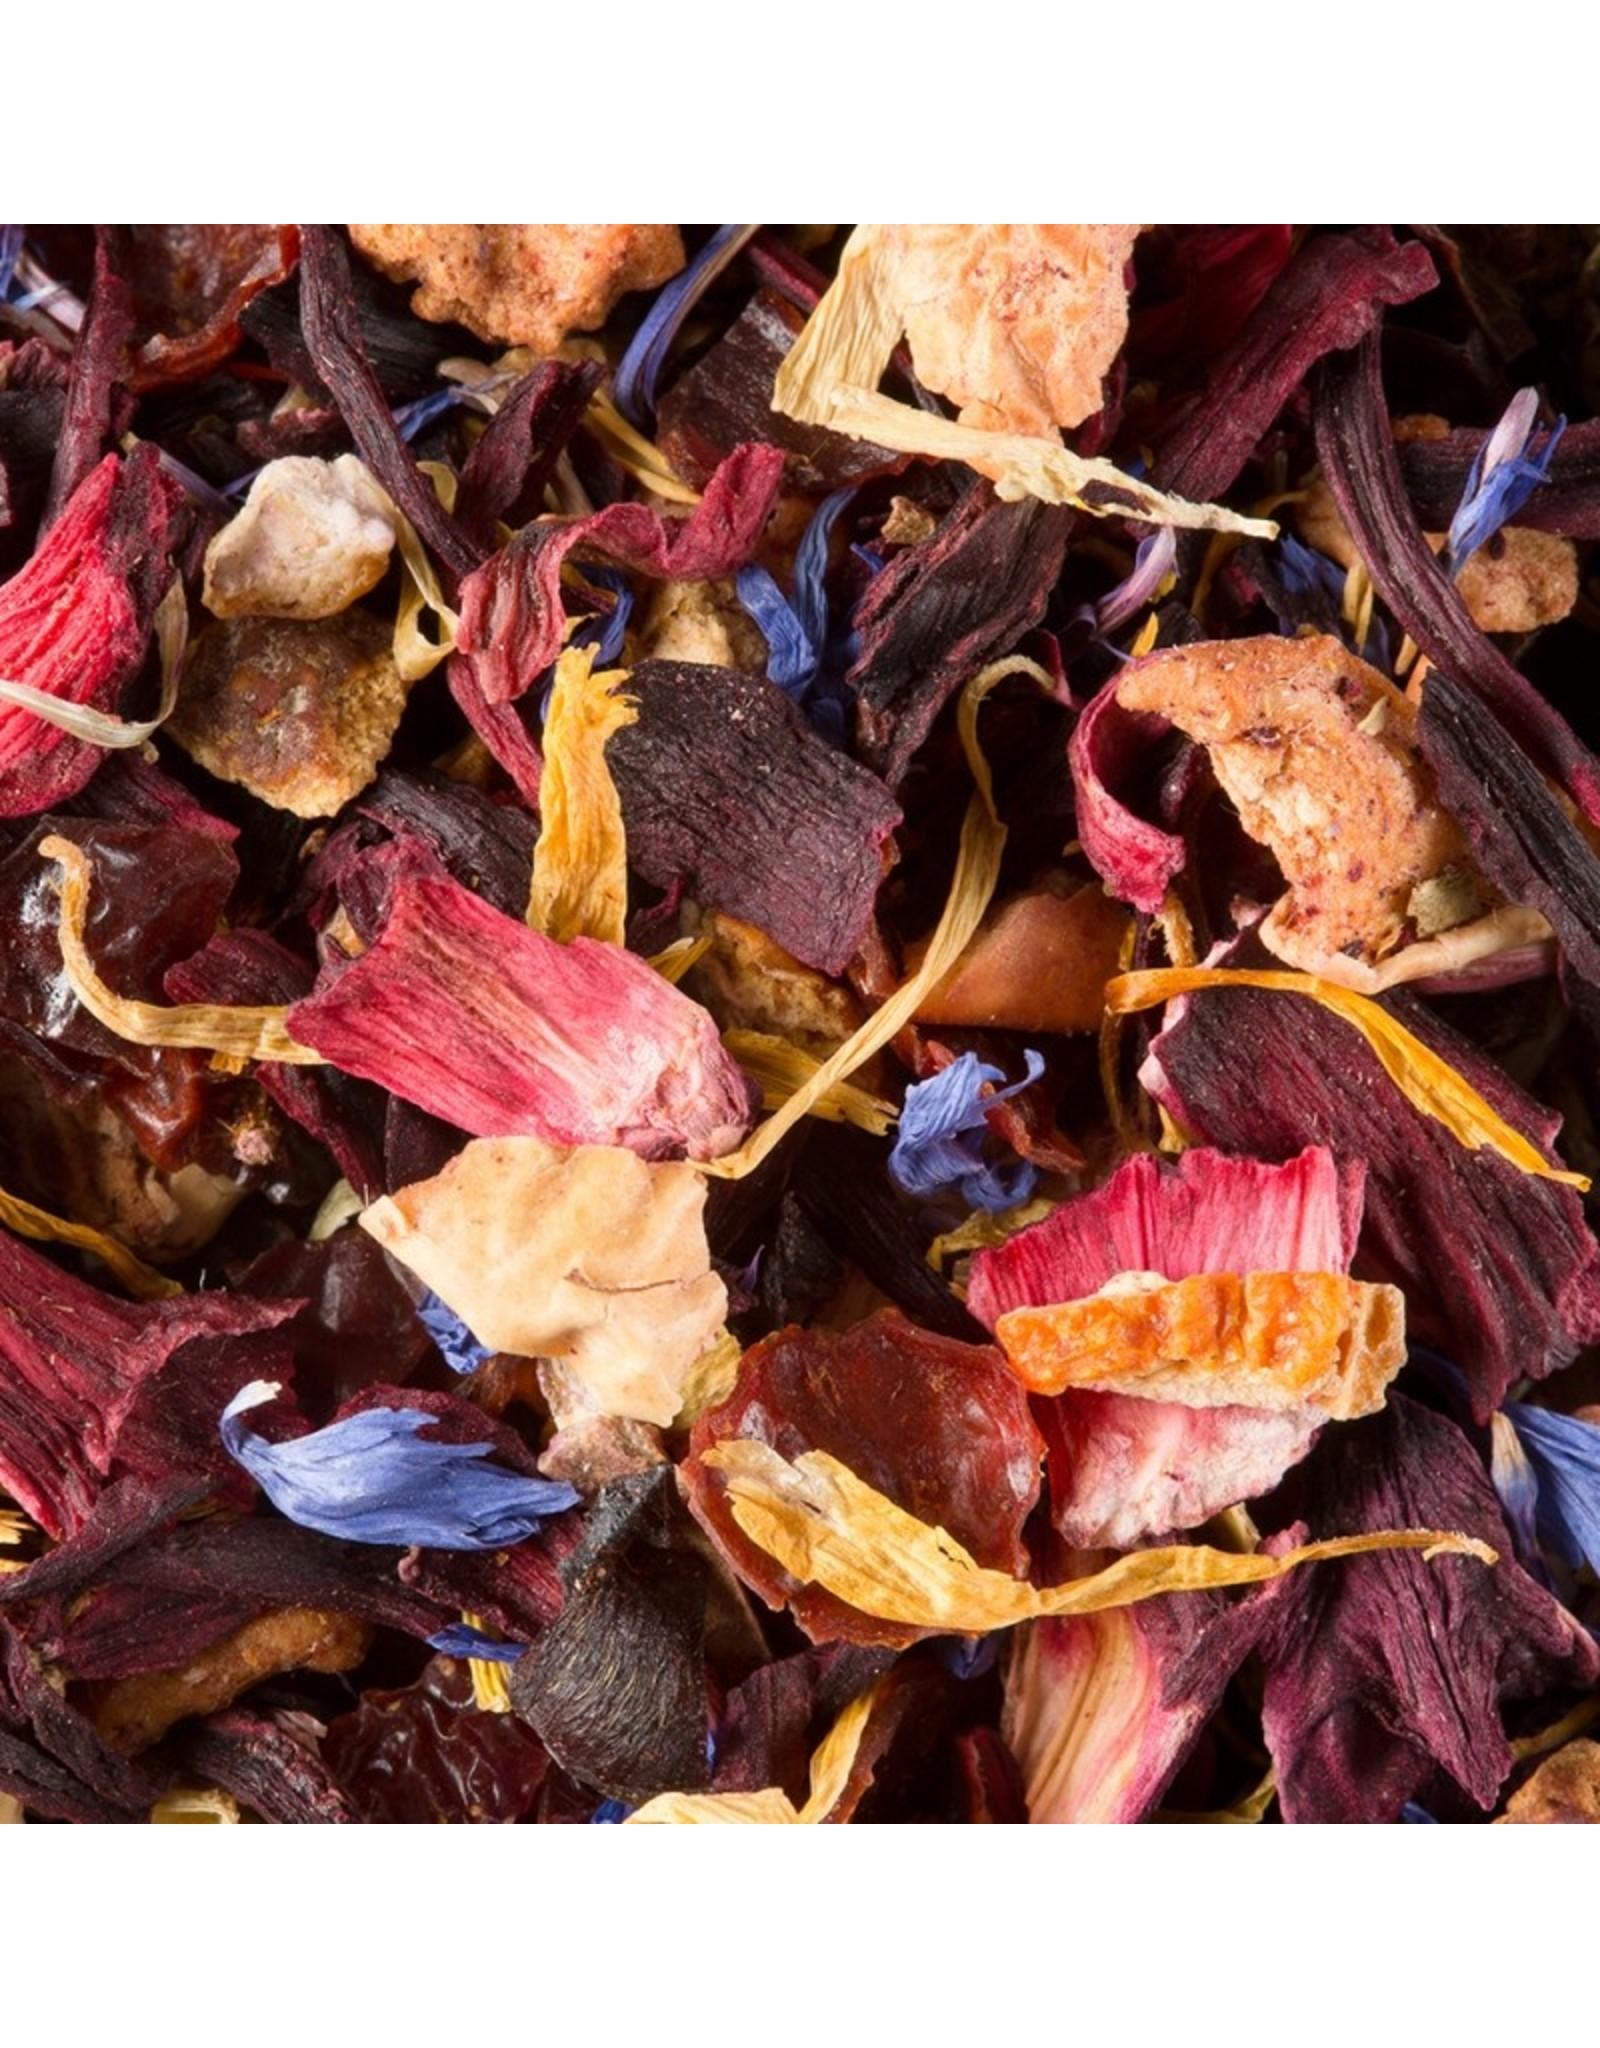 Dammann 'Carcadet Samba' Flavoured Fruit Infusion